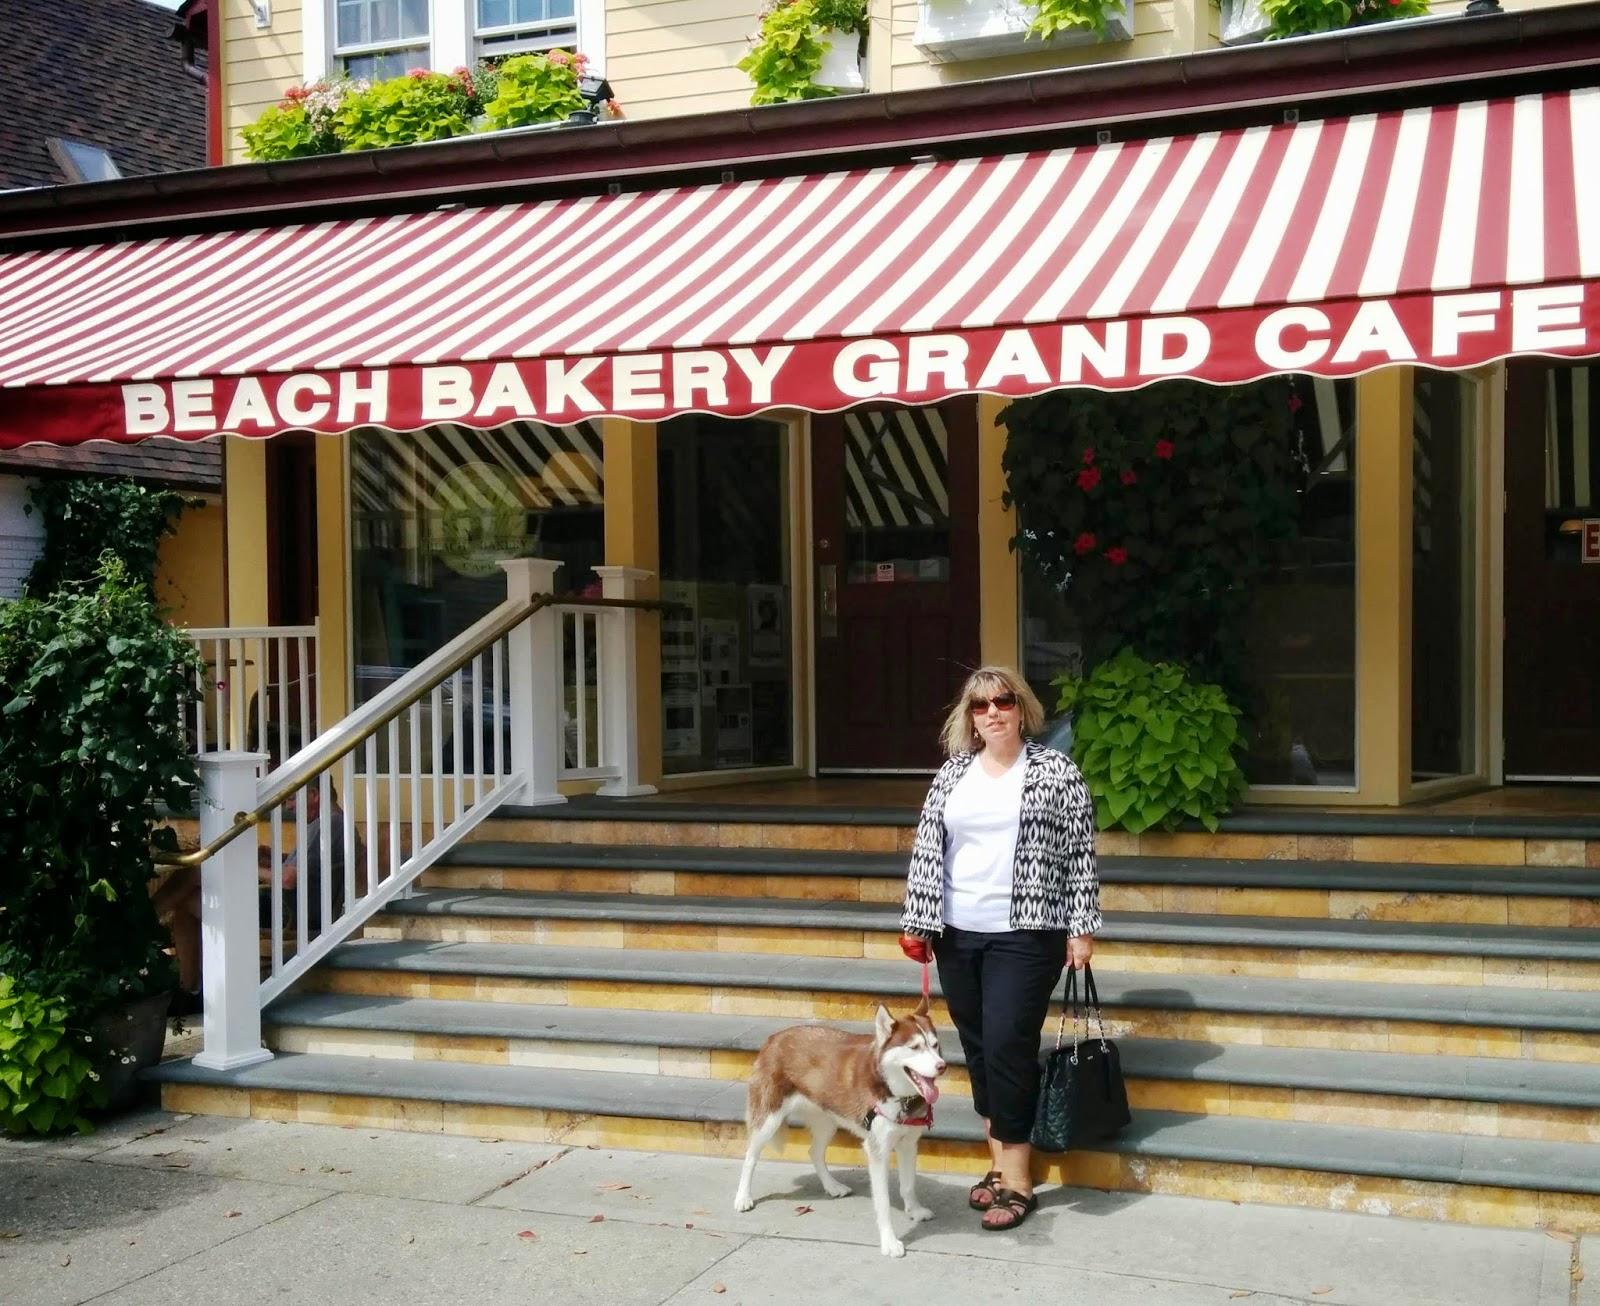 At dog friendly Beach Bakery Grand Cafe in The Hamptons, Long Island NY